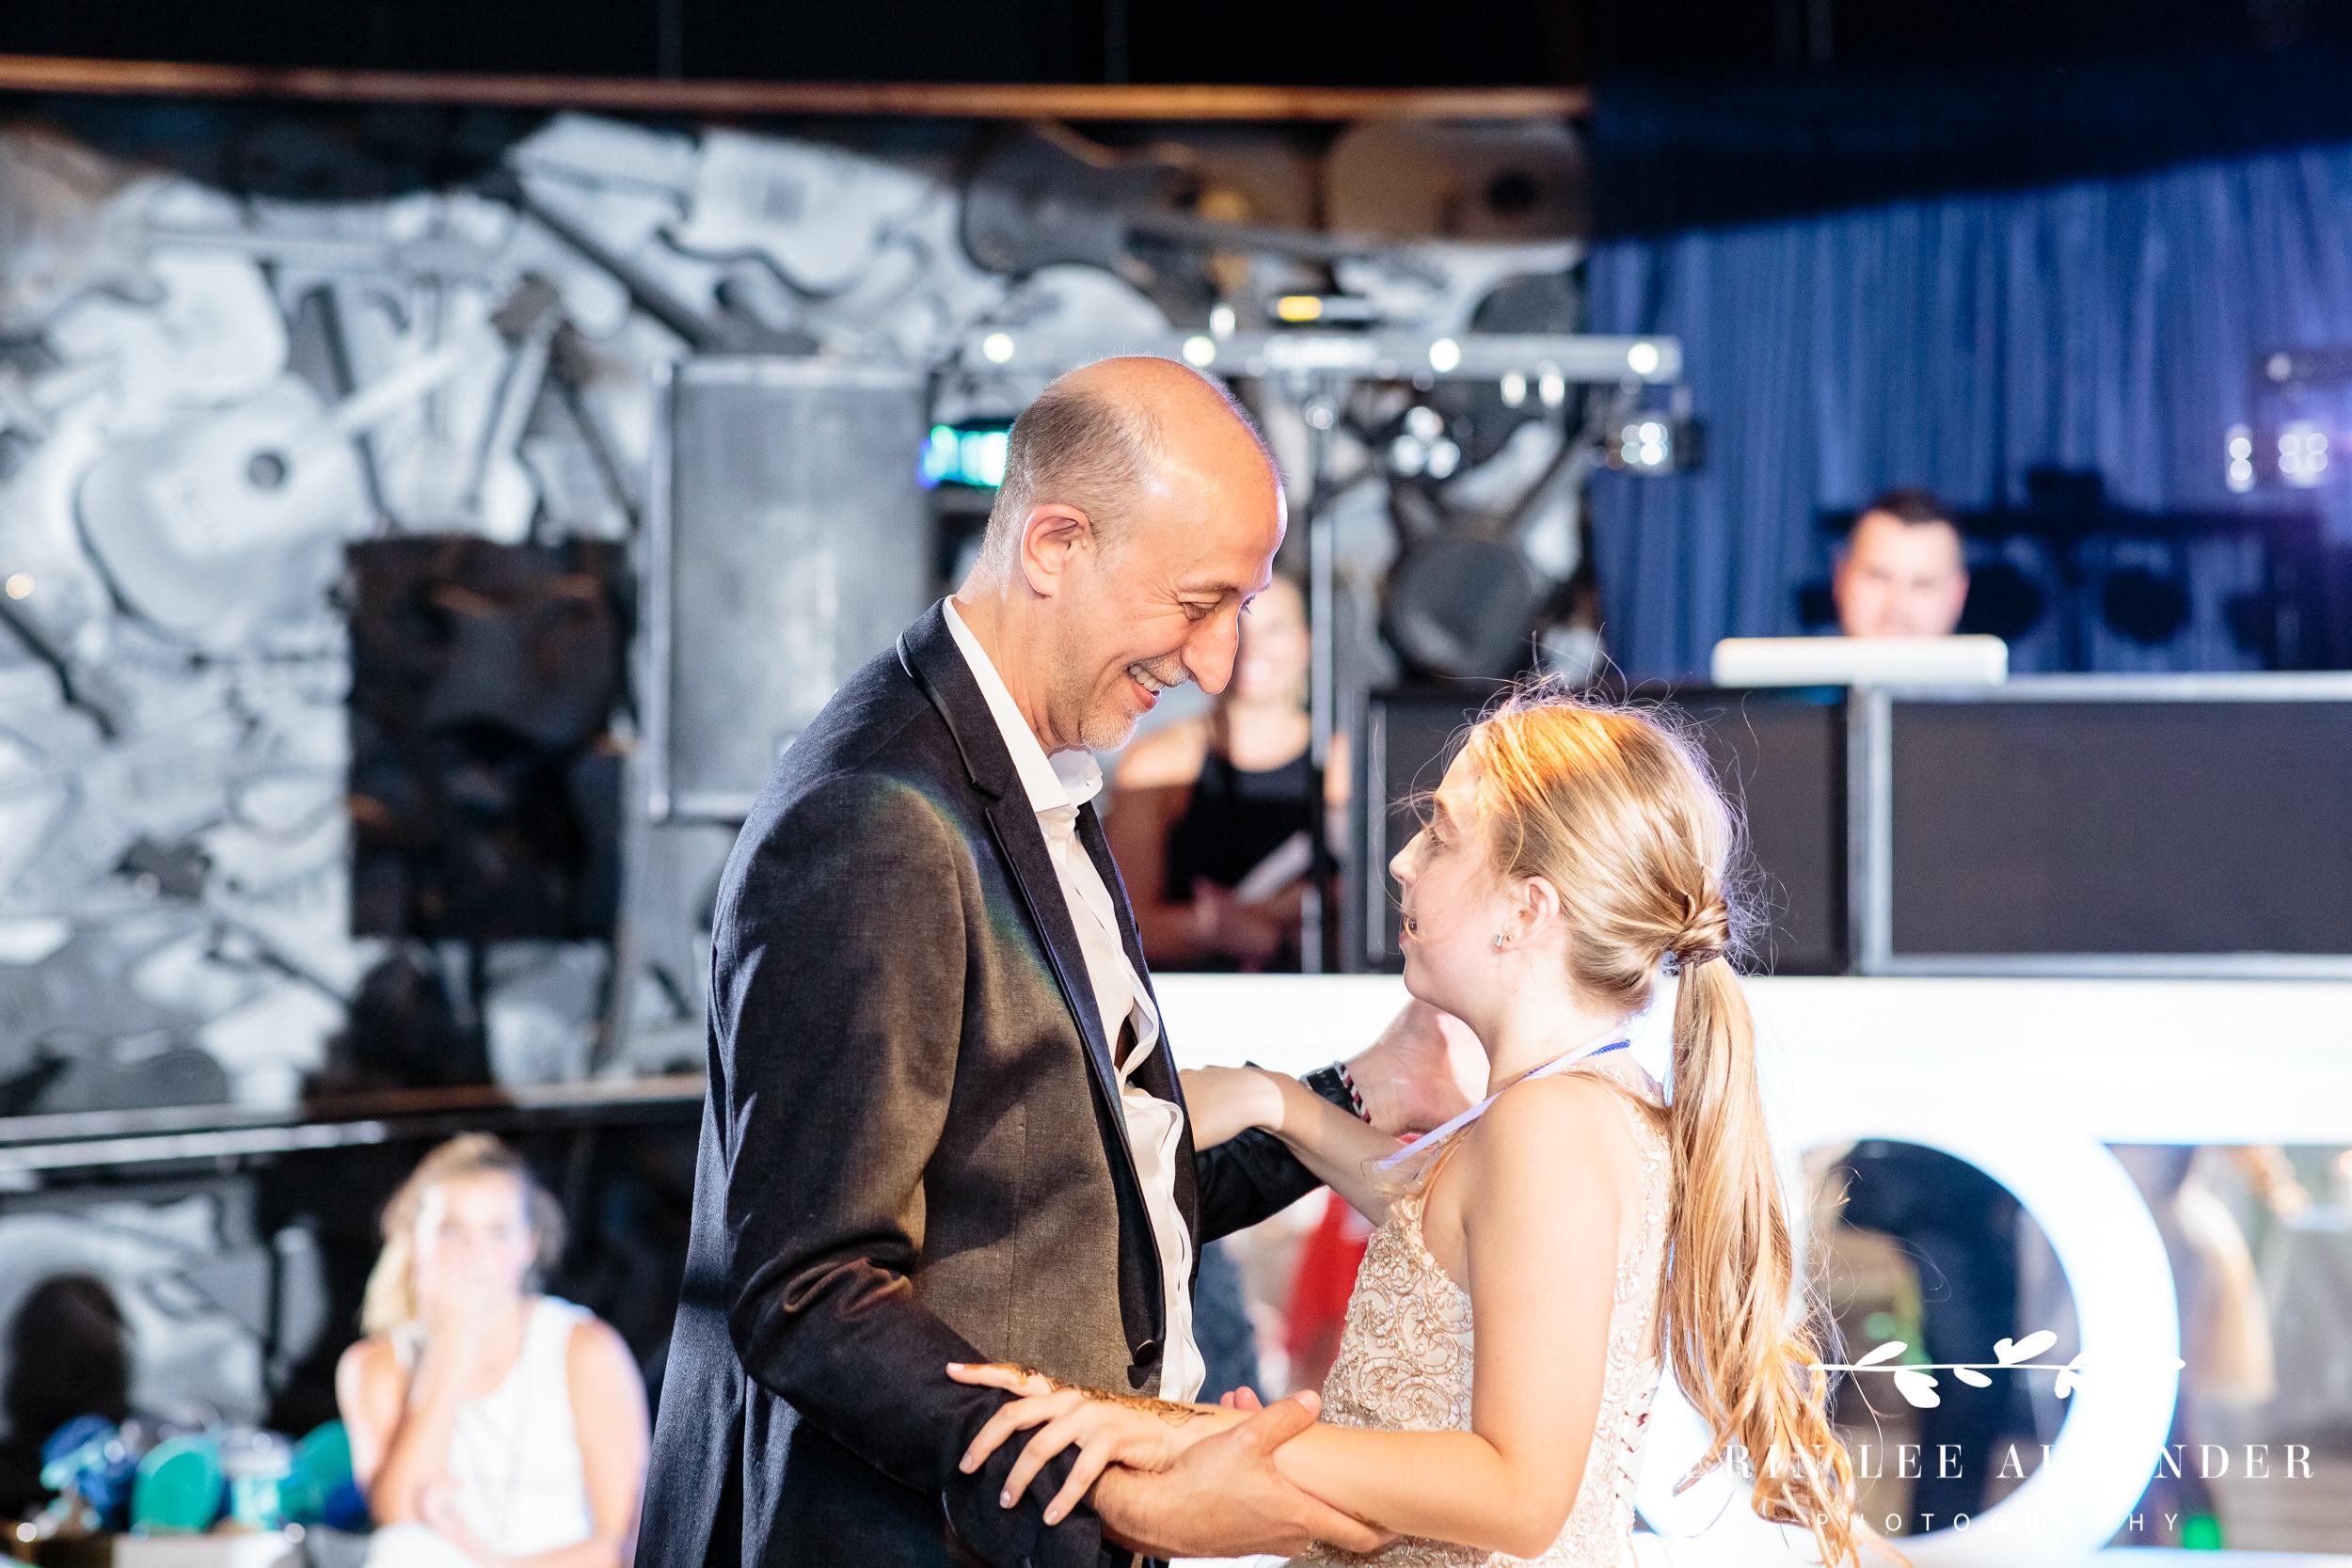 Dad_Dancing_With_Bat_Mitzvah